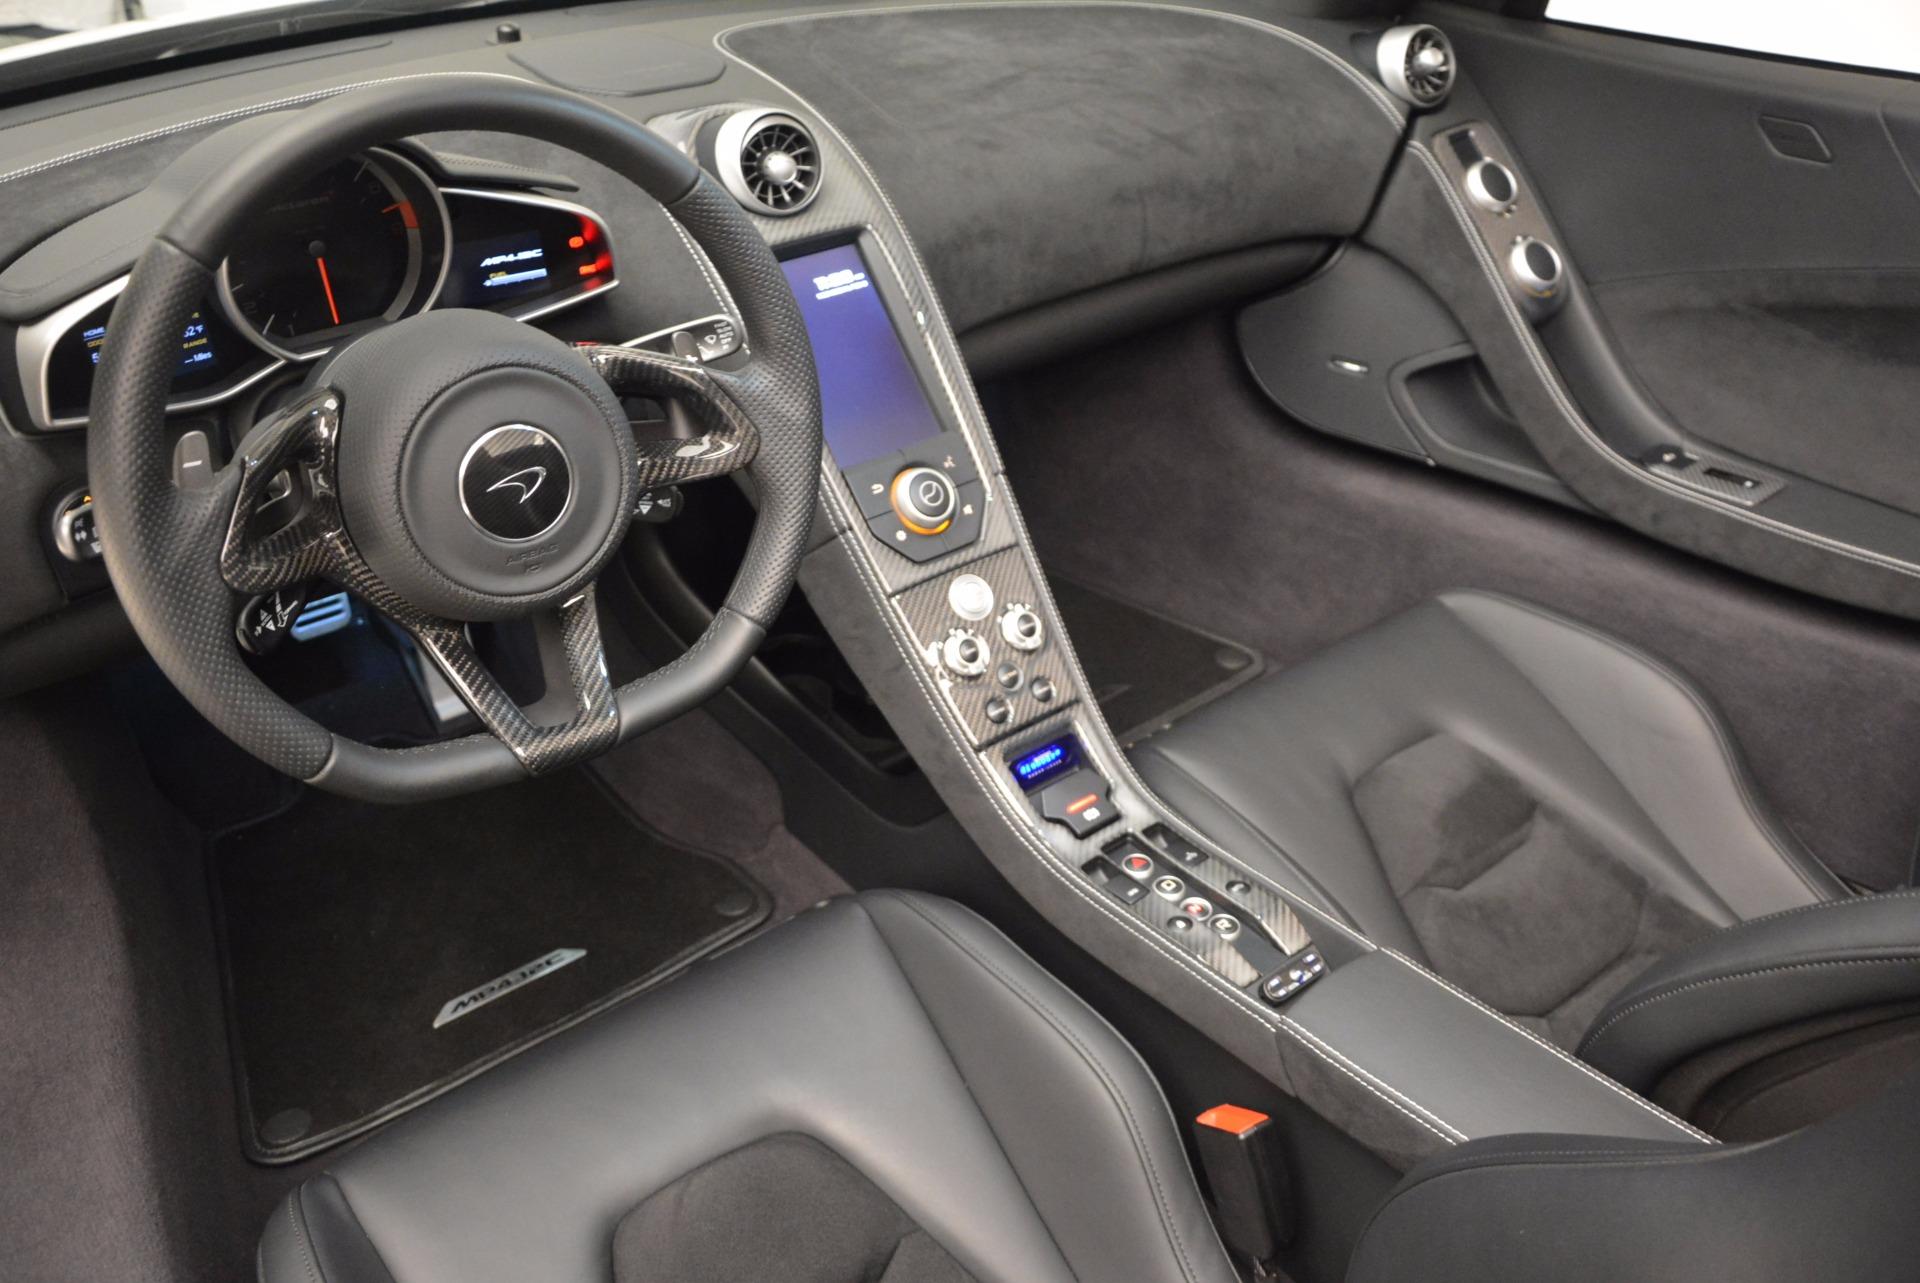 Used 2014 McLaren MP4-12C Spider For Sale In Westport, CT 908_p26